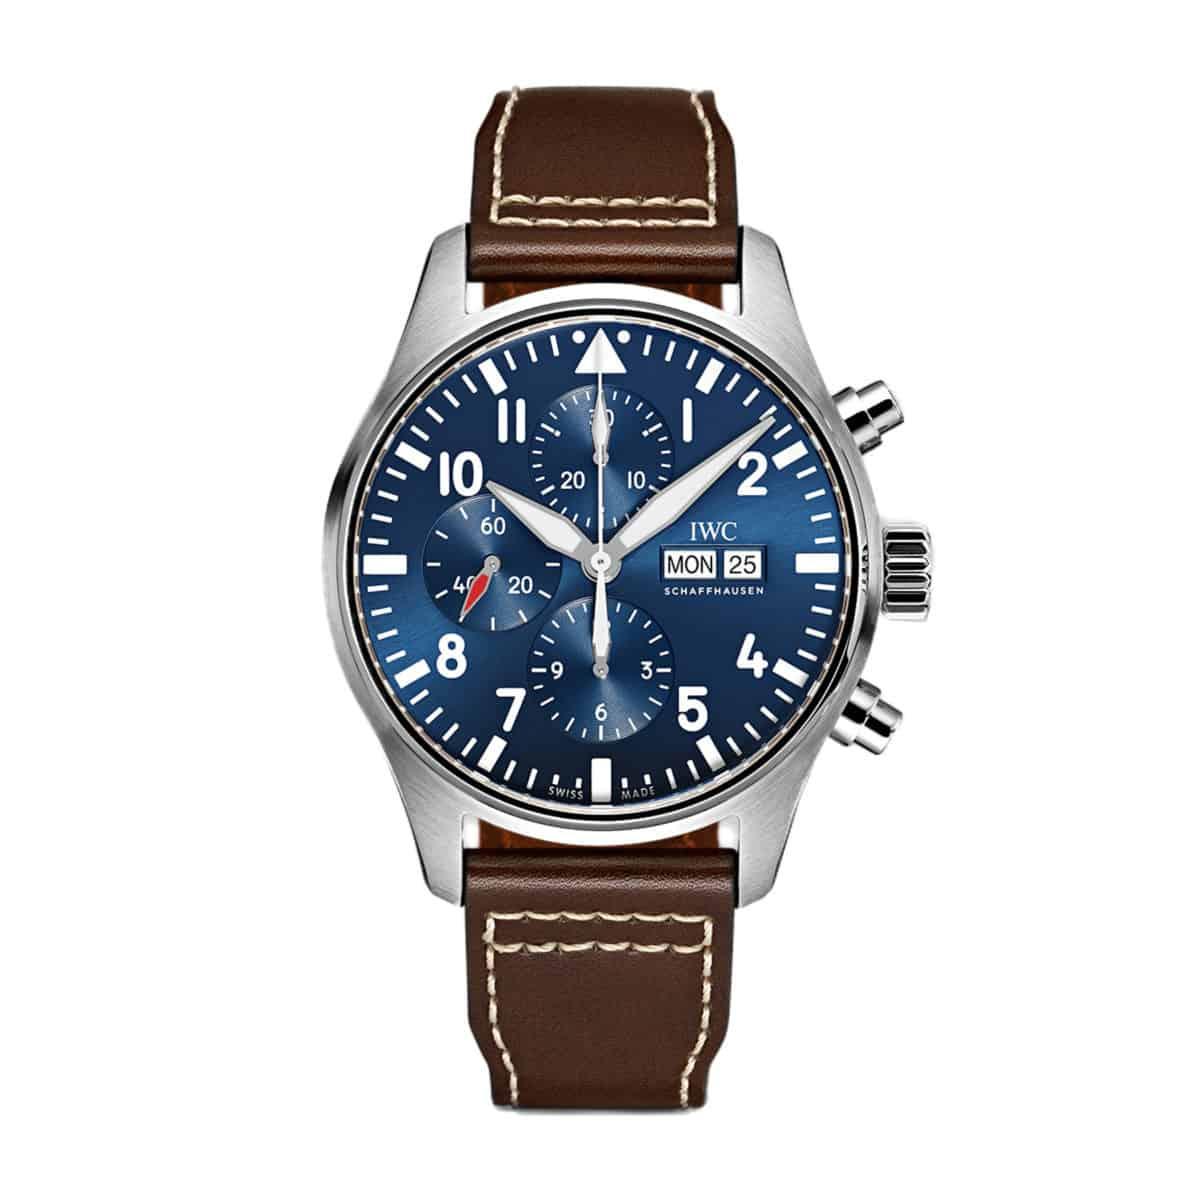 "IW377714 — IWC Schaffhausen Pilot's Watch Chronograph Edition ""Le Petit Prince"""